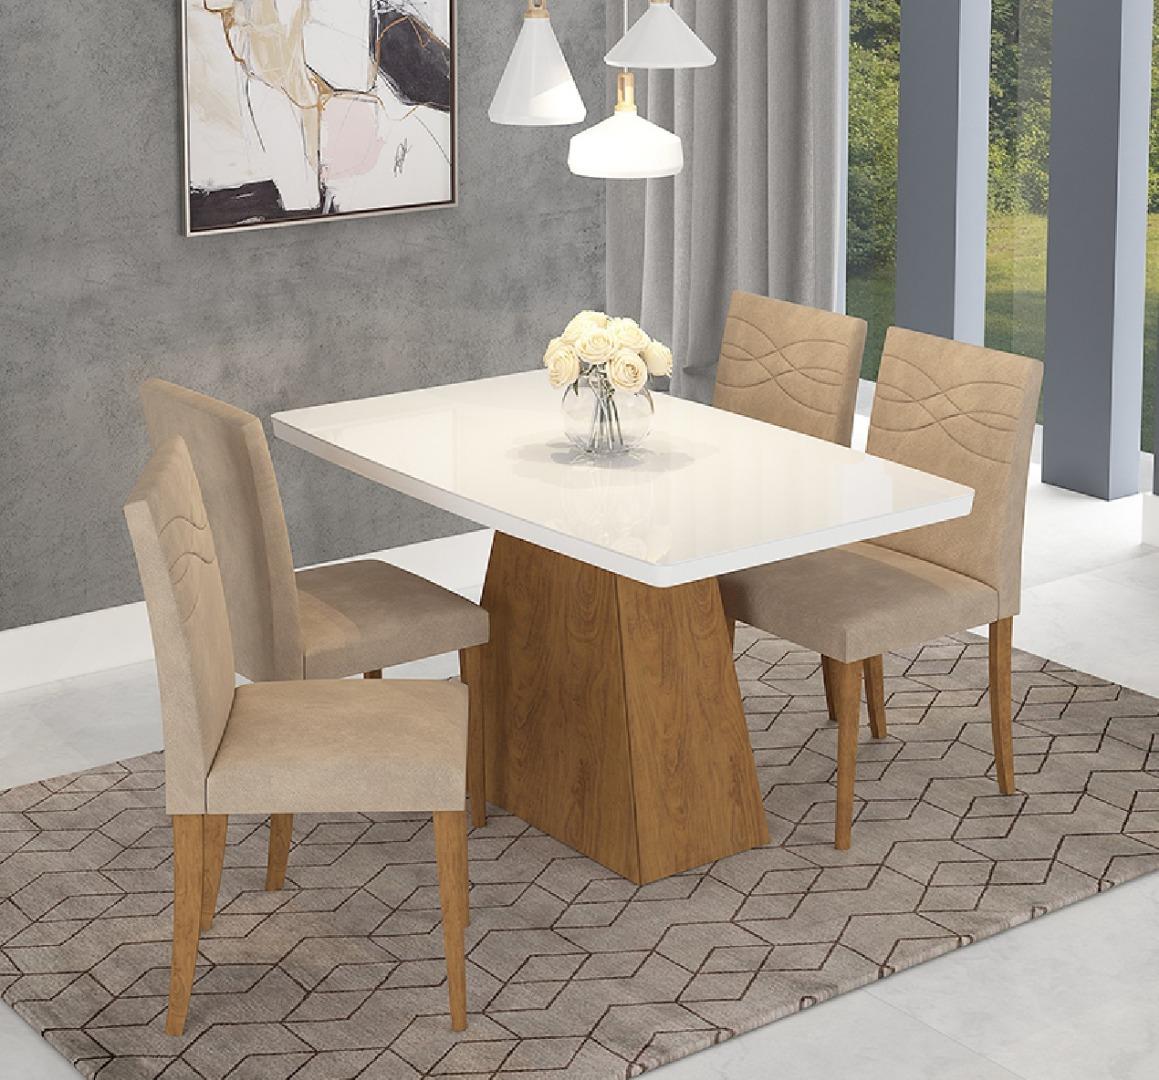 Conjunto Sala de Jantar Mesa Tampo em Vidro Helen - 4 Cadeiras Marina Savana/Branco/Caramelo - Cimol